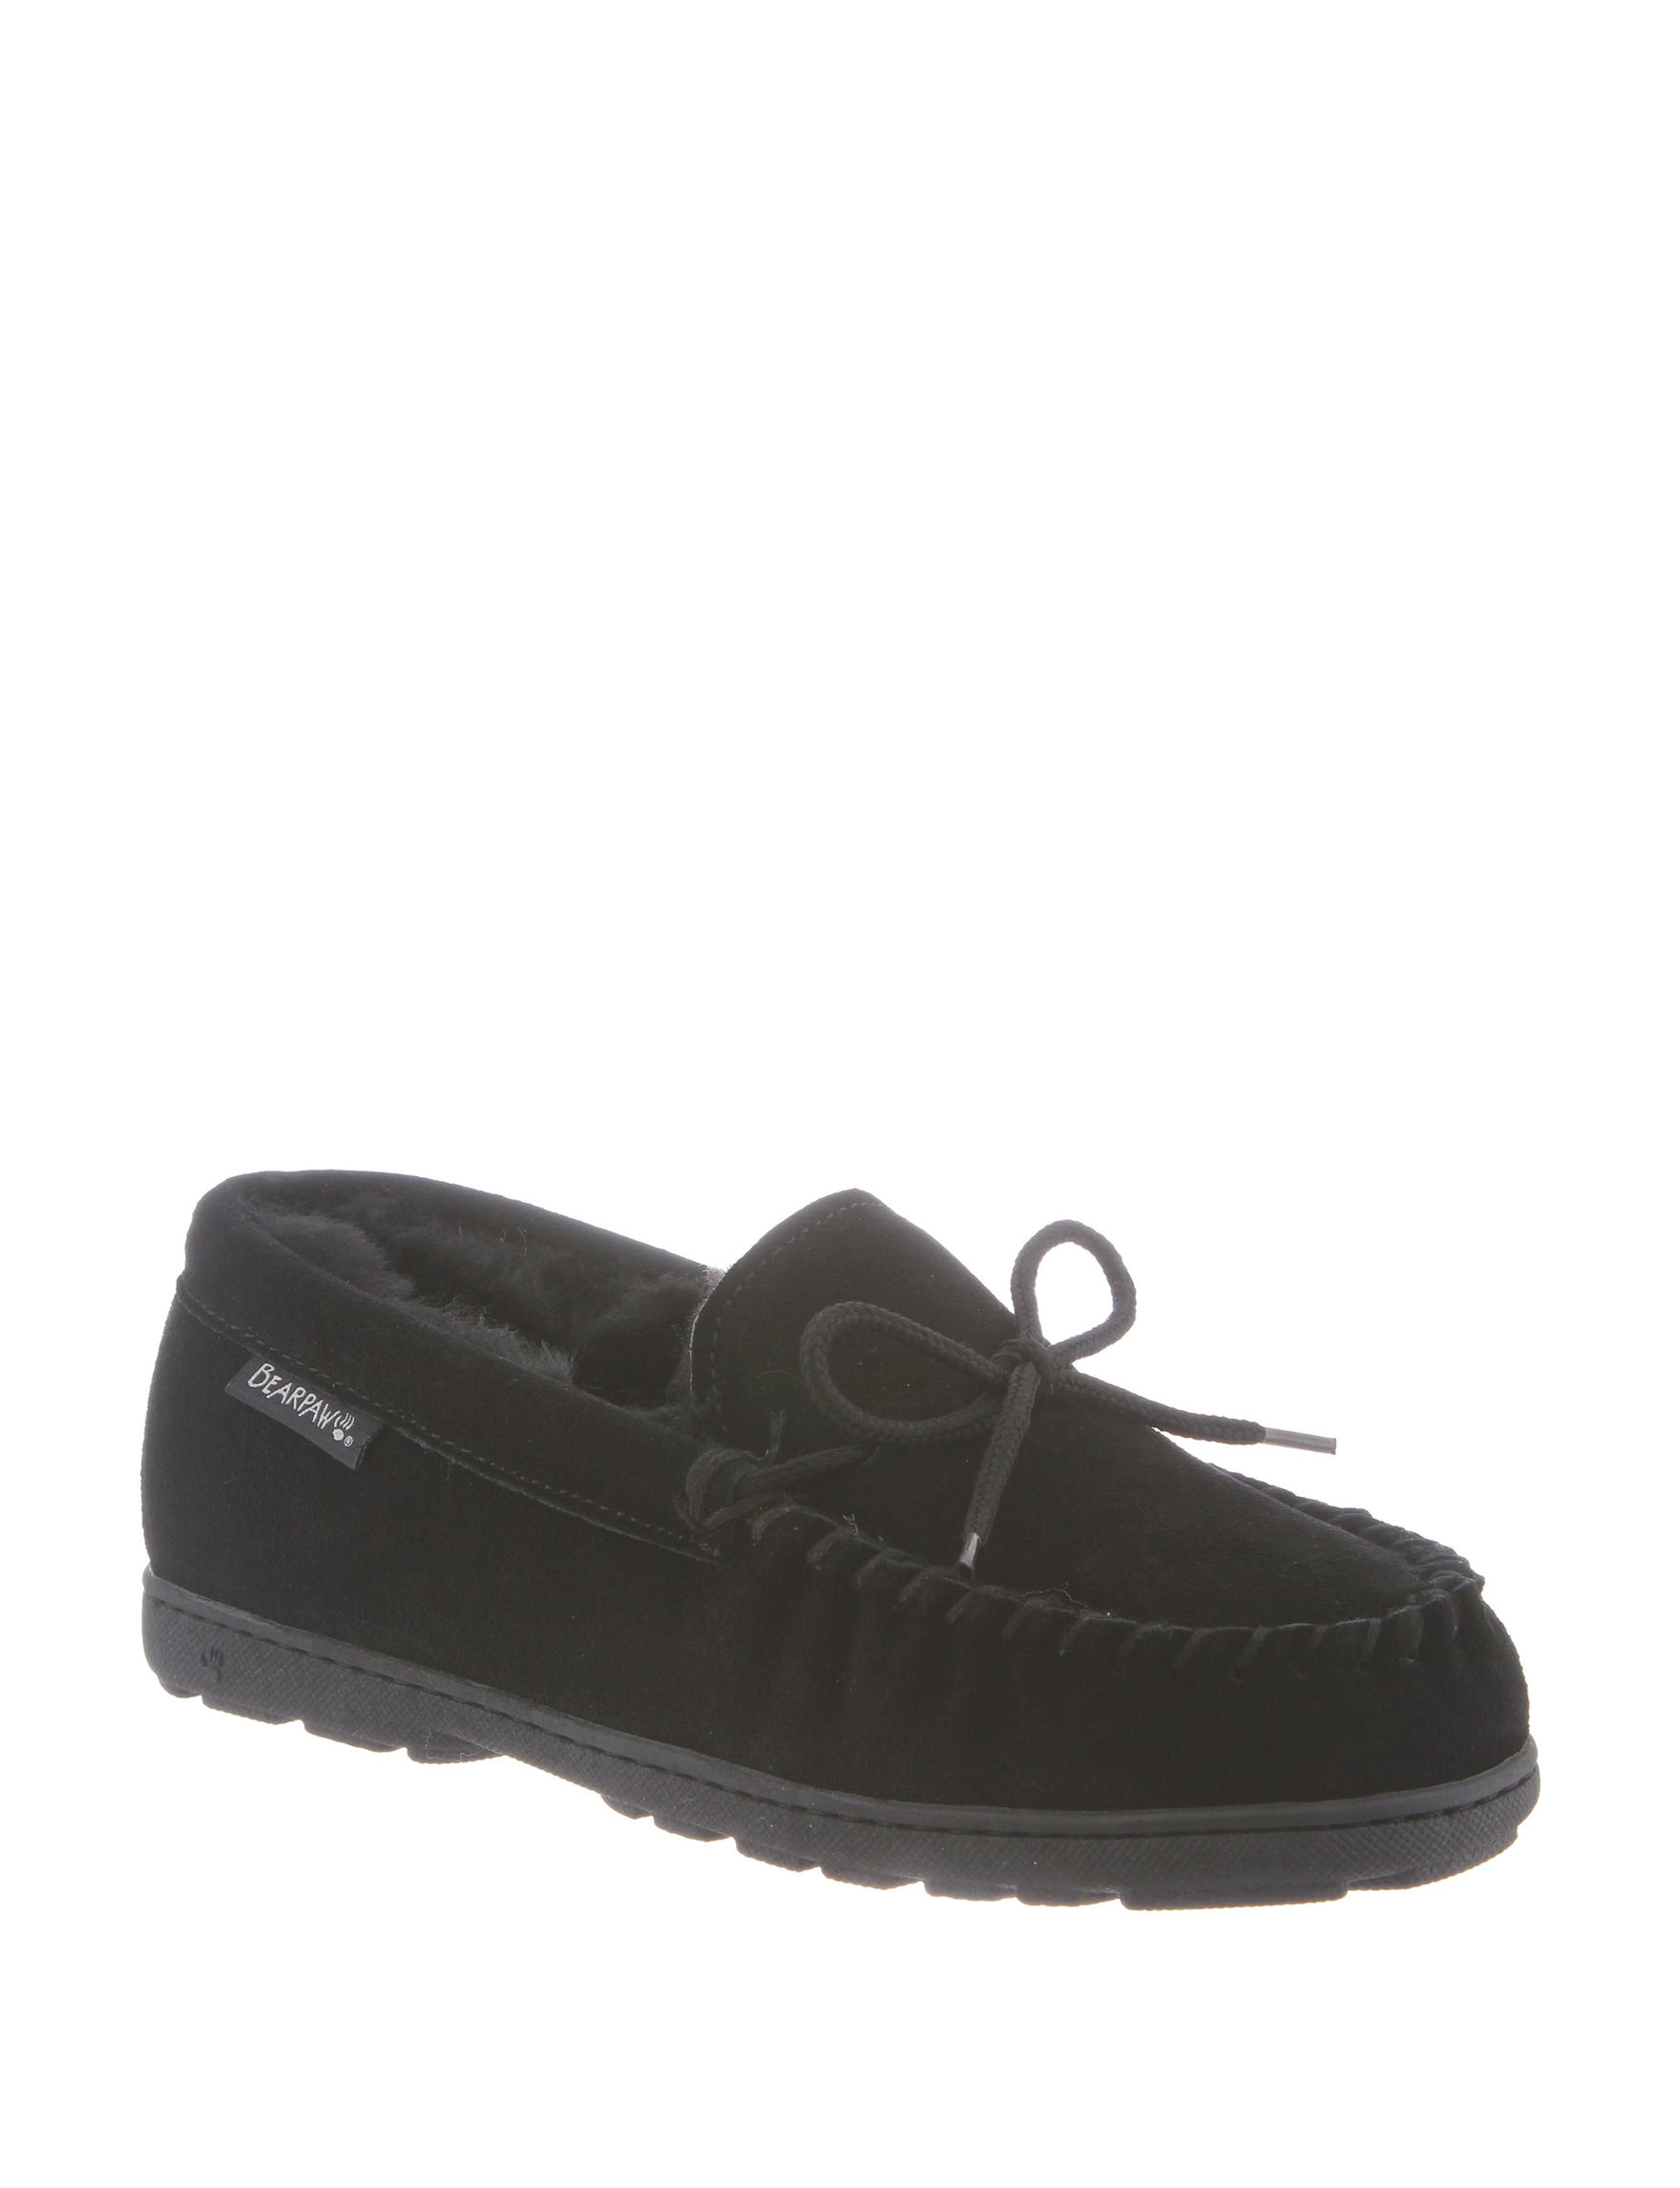 Bearpaw Black Slipper Shoes